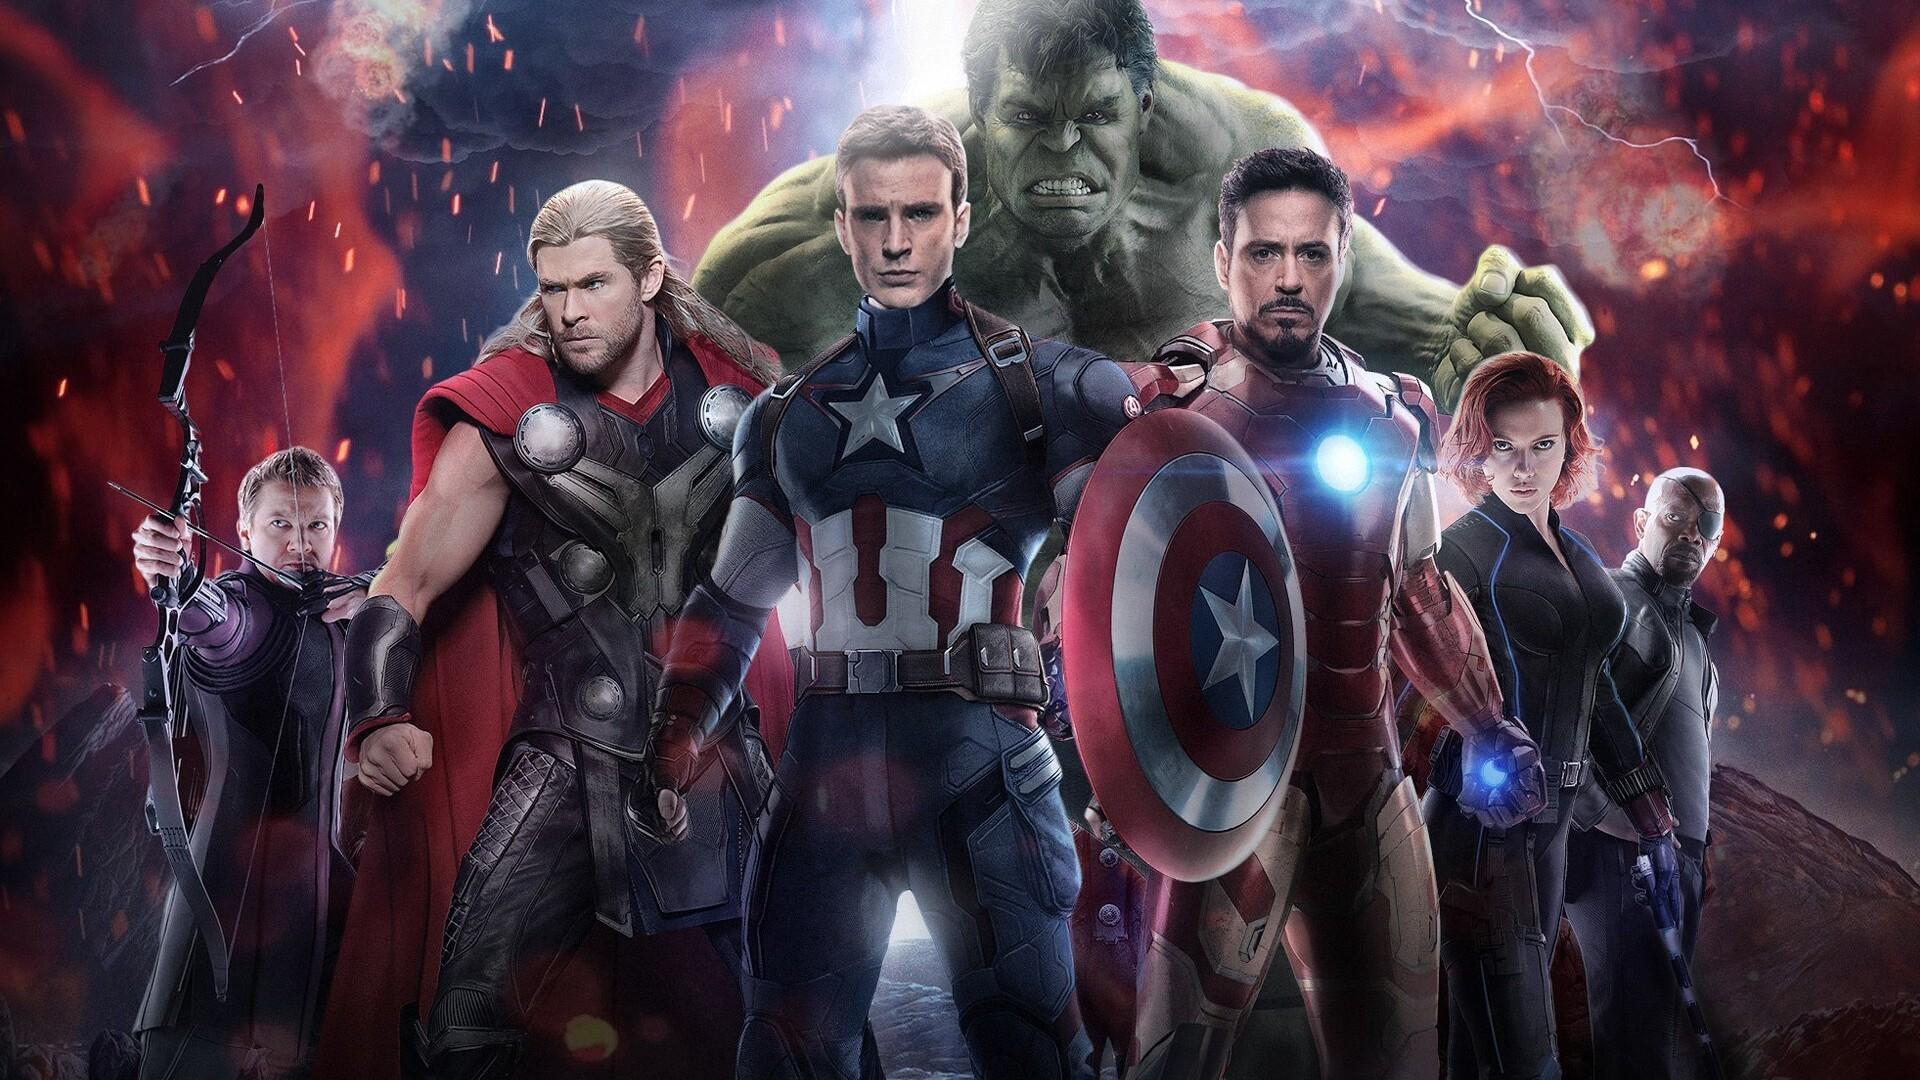 1920x1080 Avengers Age Of Ultron Laptop Full HD 1080P HD ...